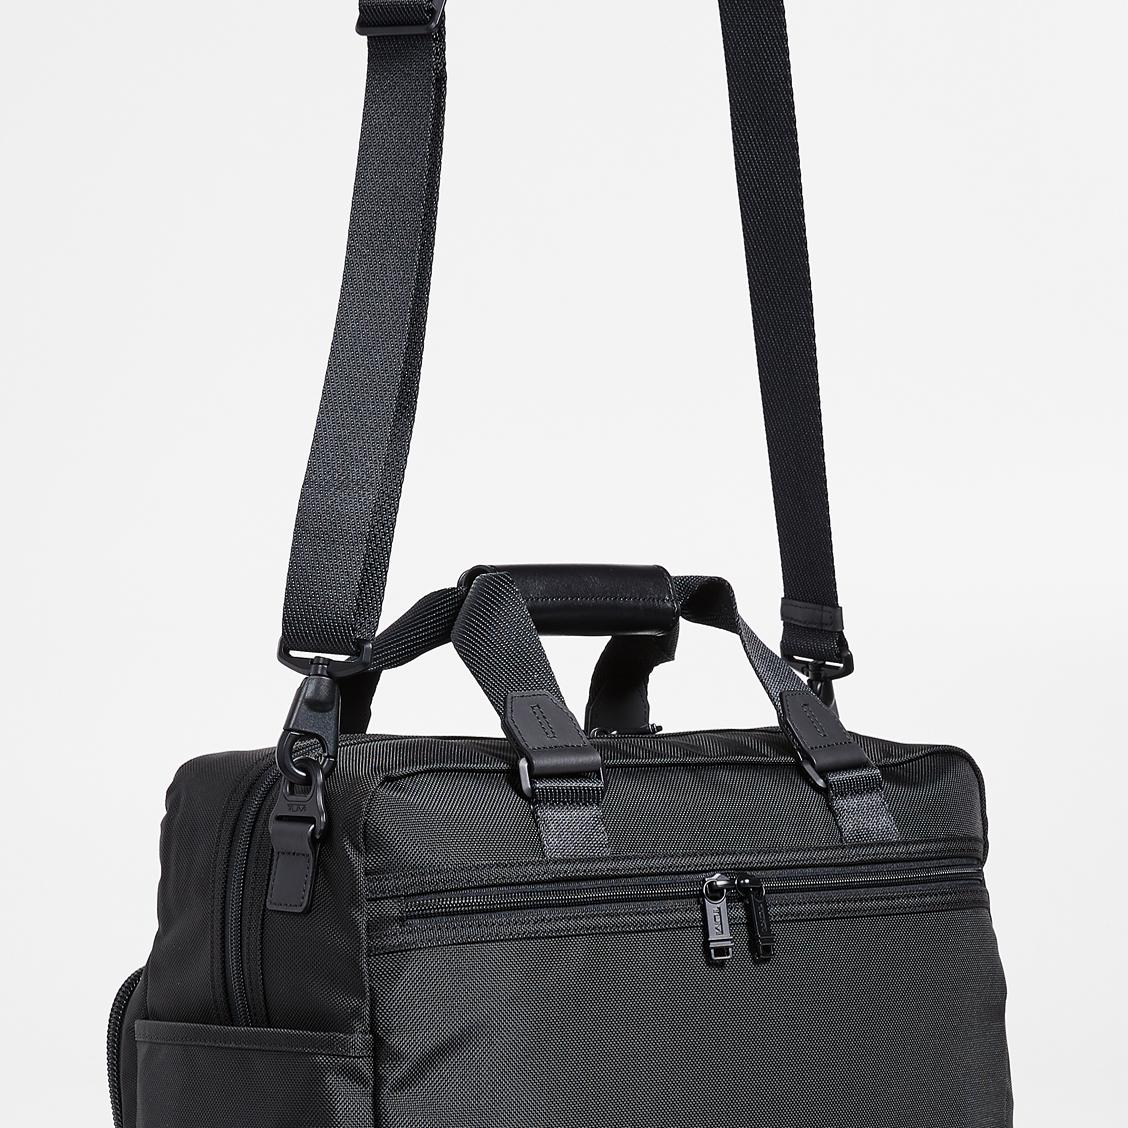 7590516add9b Tumi Alpha Bravo Hunter Messenger Bag